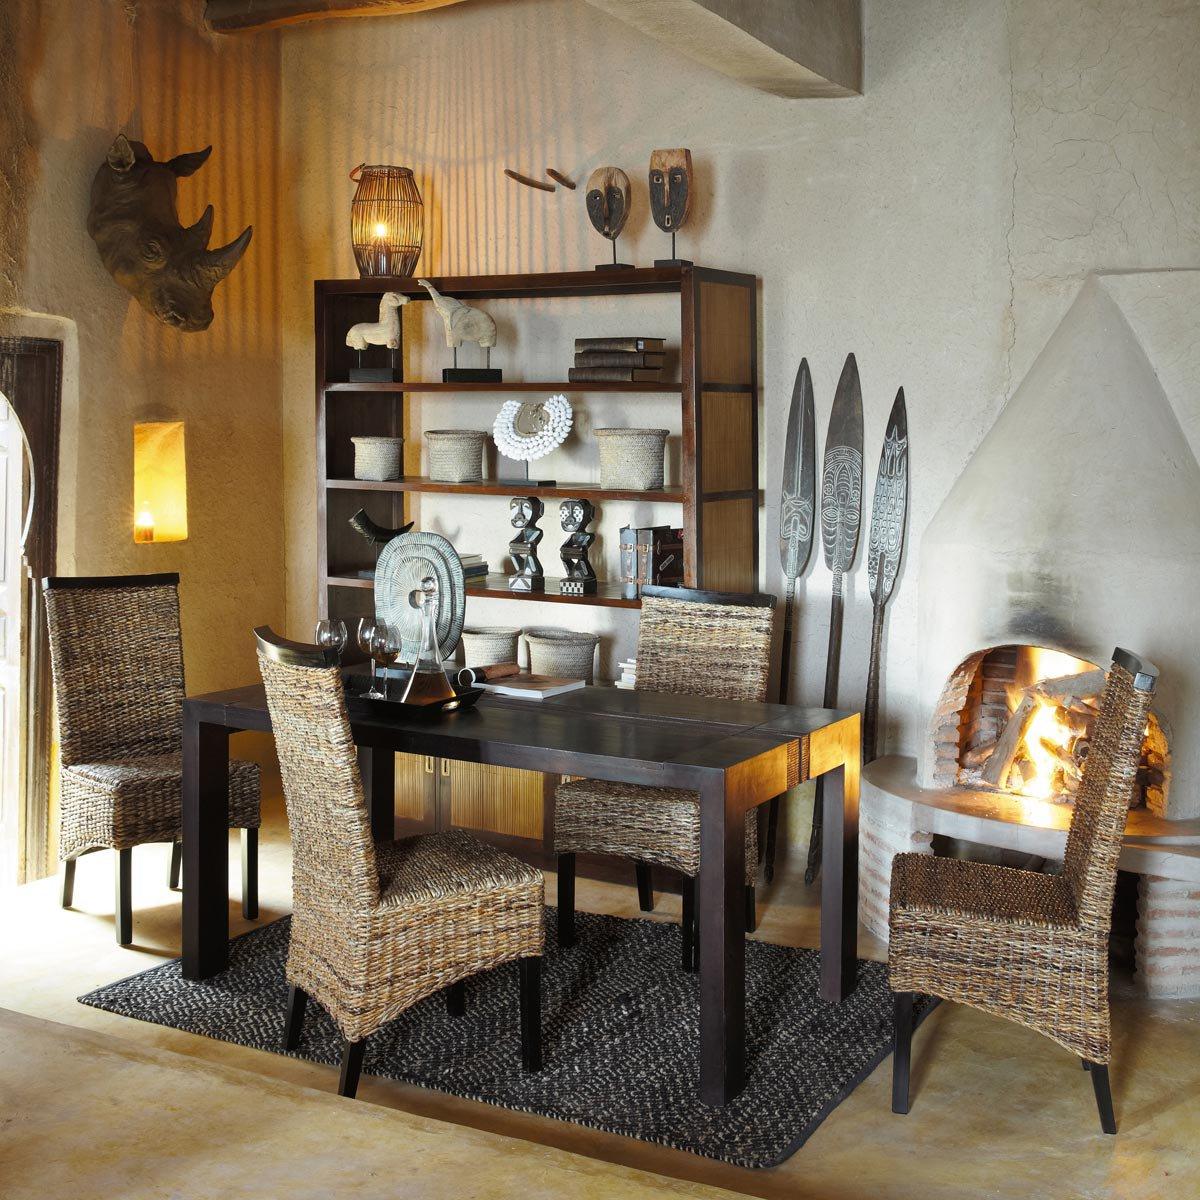 4bildcasa marzo 2013. Black Bedroom Furniture Sets. Home Design Ideas